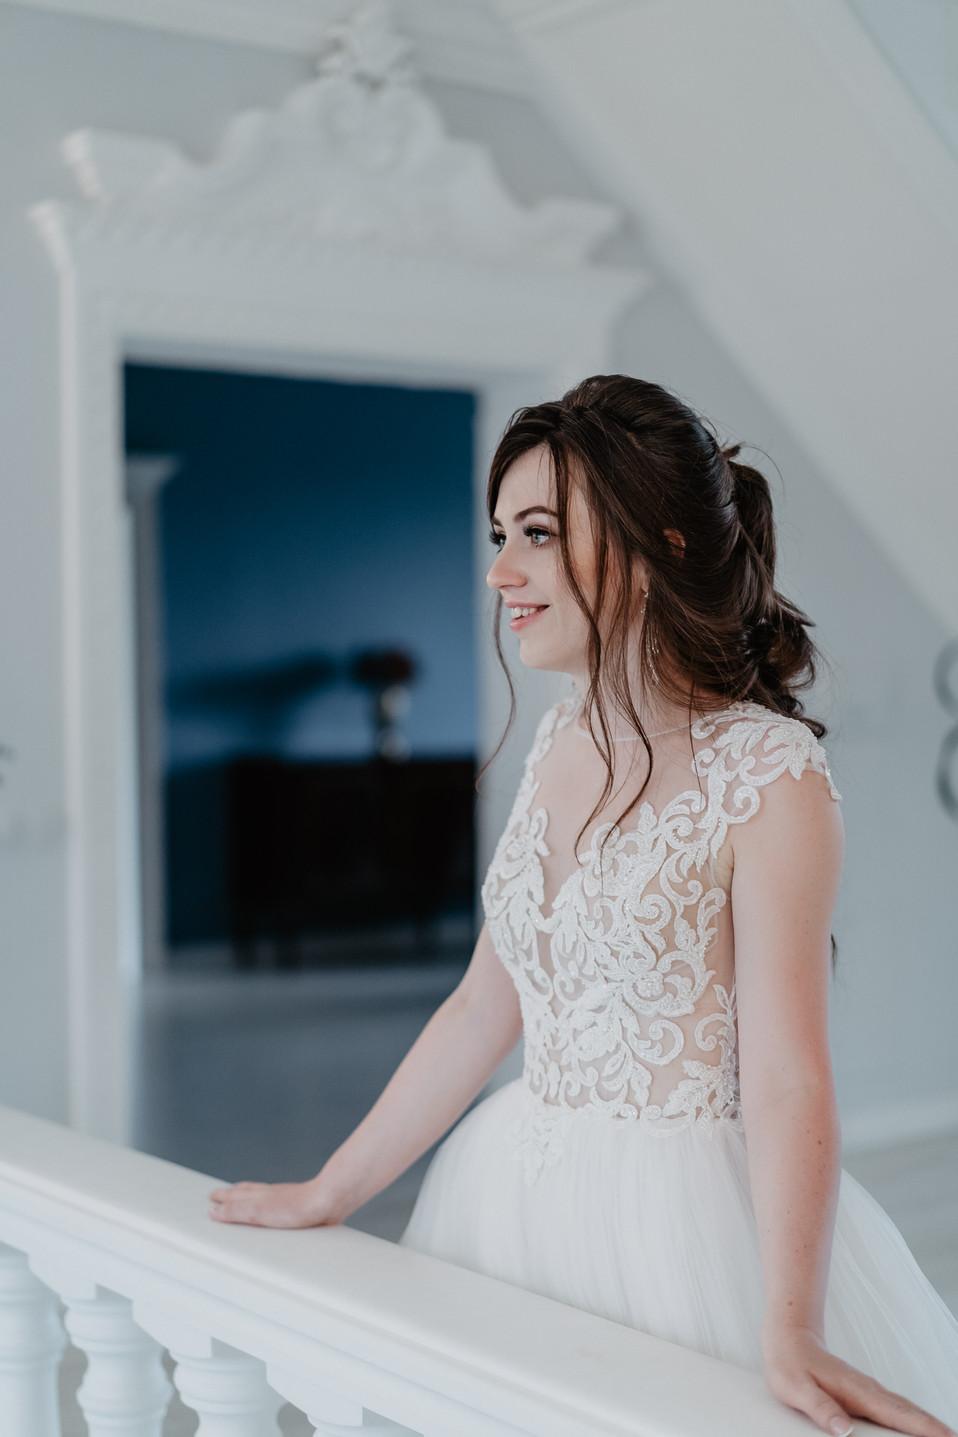 ArtSoul_Wedding_anons-19.jpg